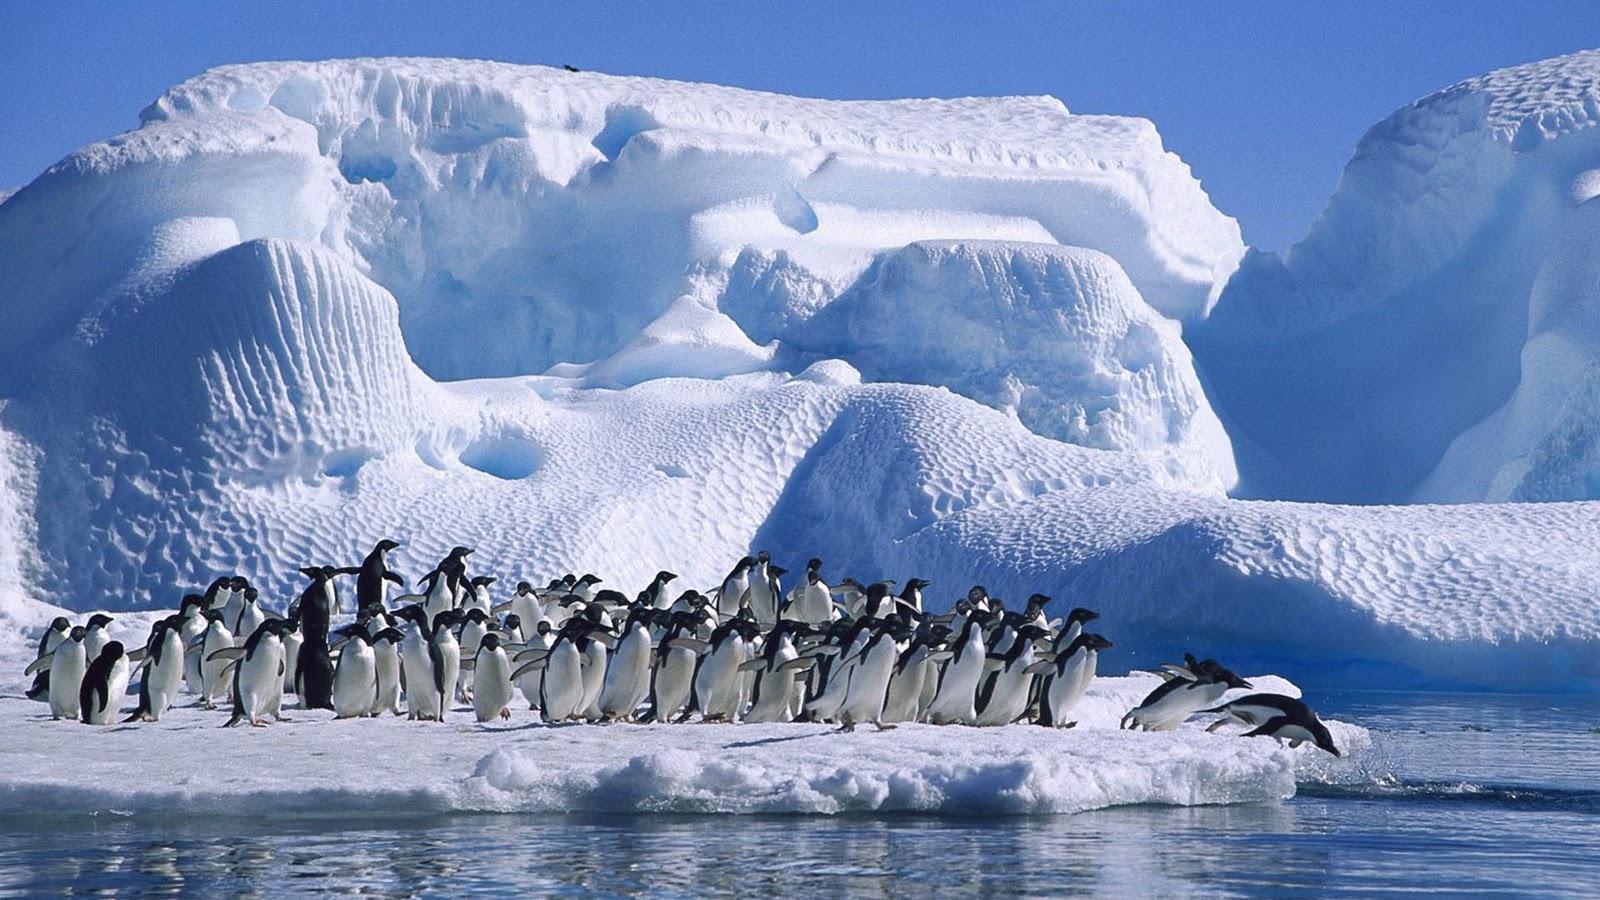 http://1.bp.blogspot.com/-ur52GH4mY7g/TvylI1hD_0I/AAAAAAAAAGQ/ZRBQxsQT33A/s1600/Animal-Penguins-HD-Wallpapers.jpg